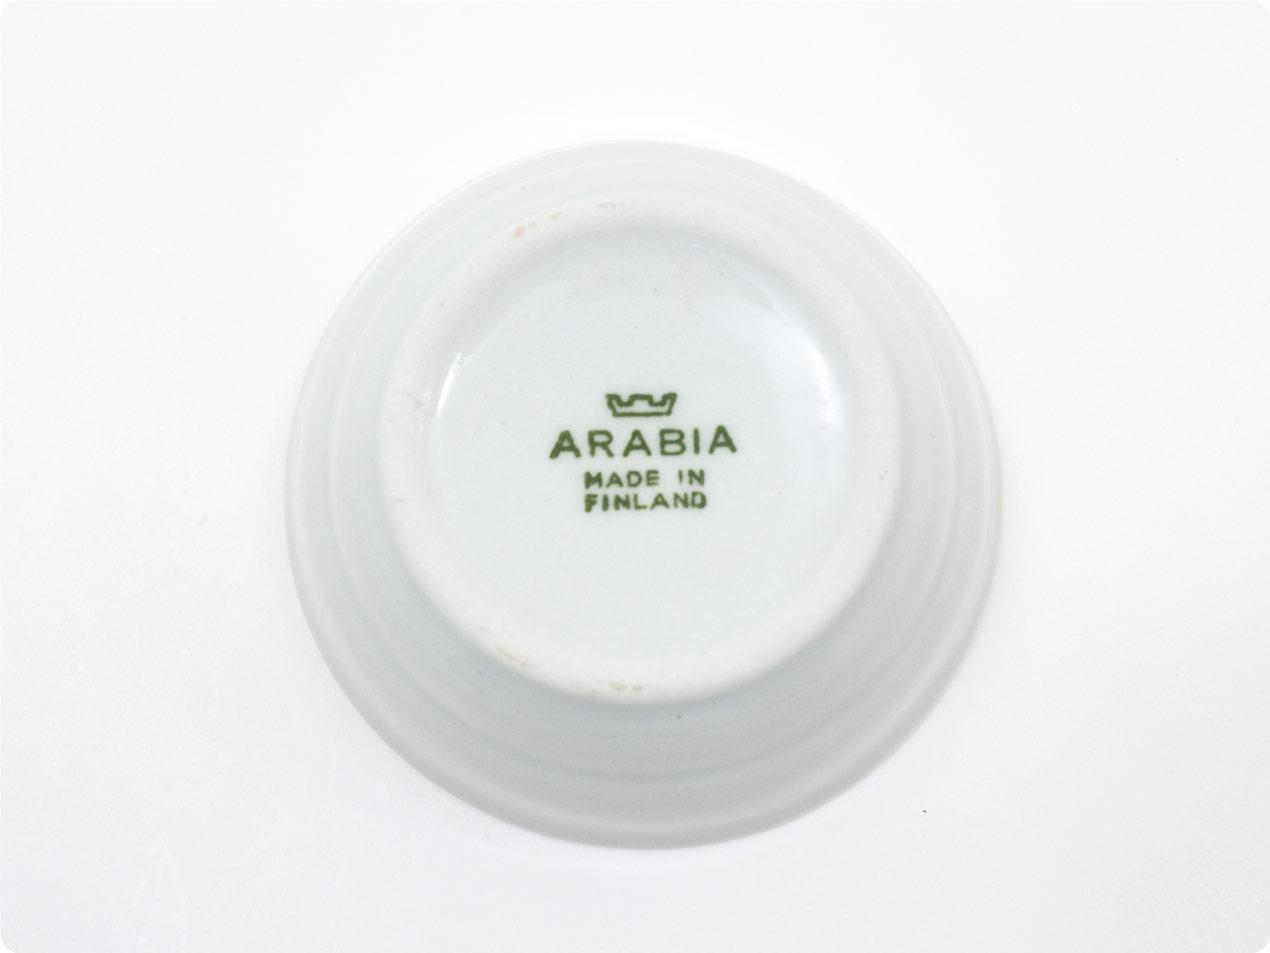 ARABIA ミニボウル